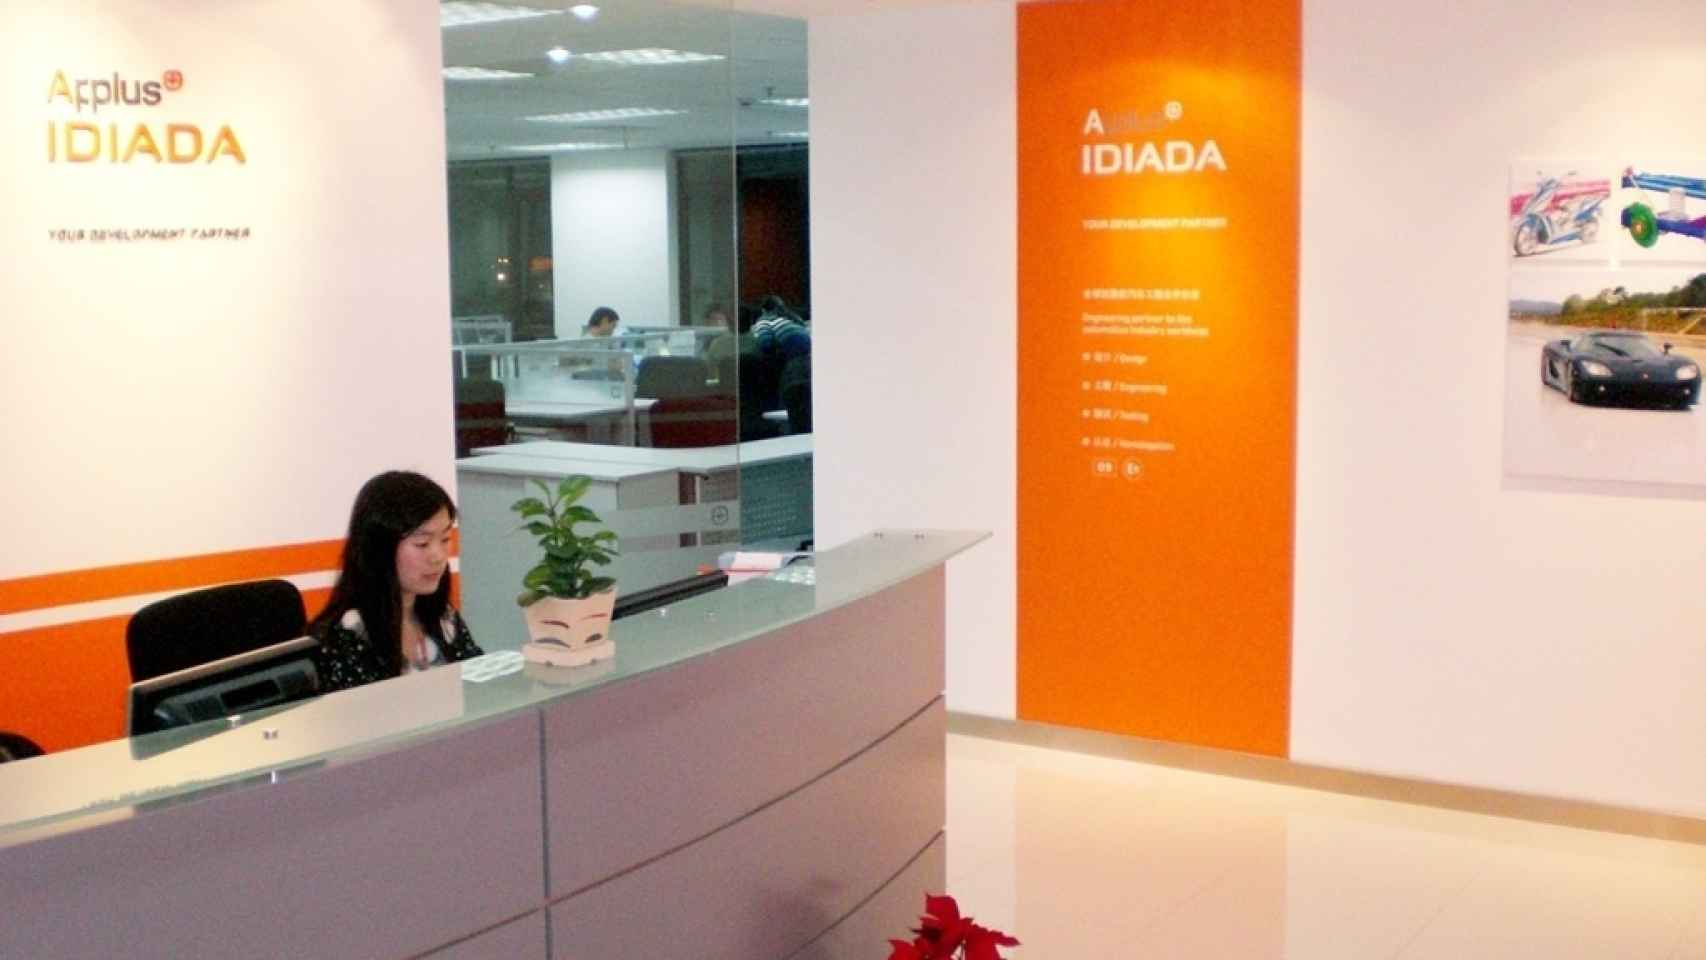 Oficina de Applus+ Idiada en China